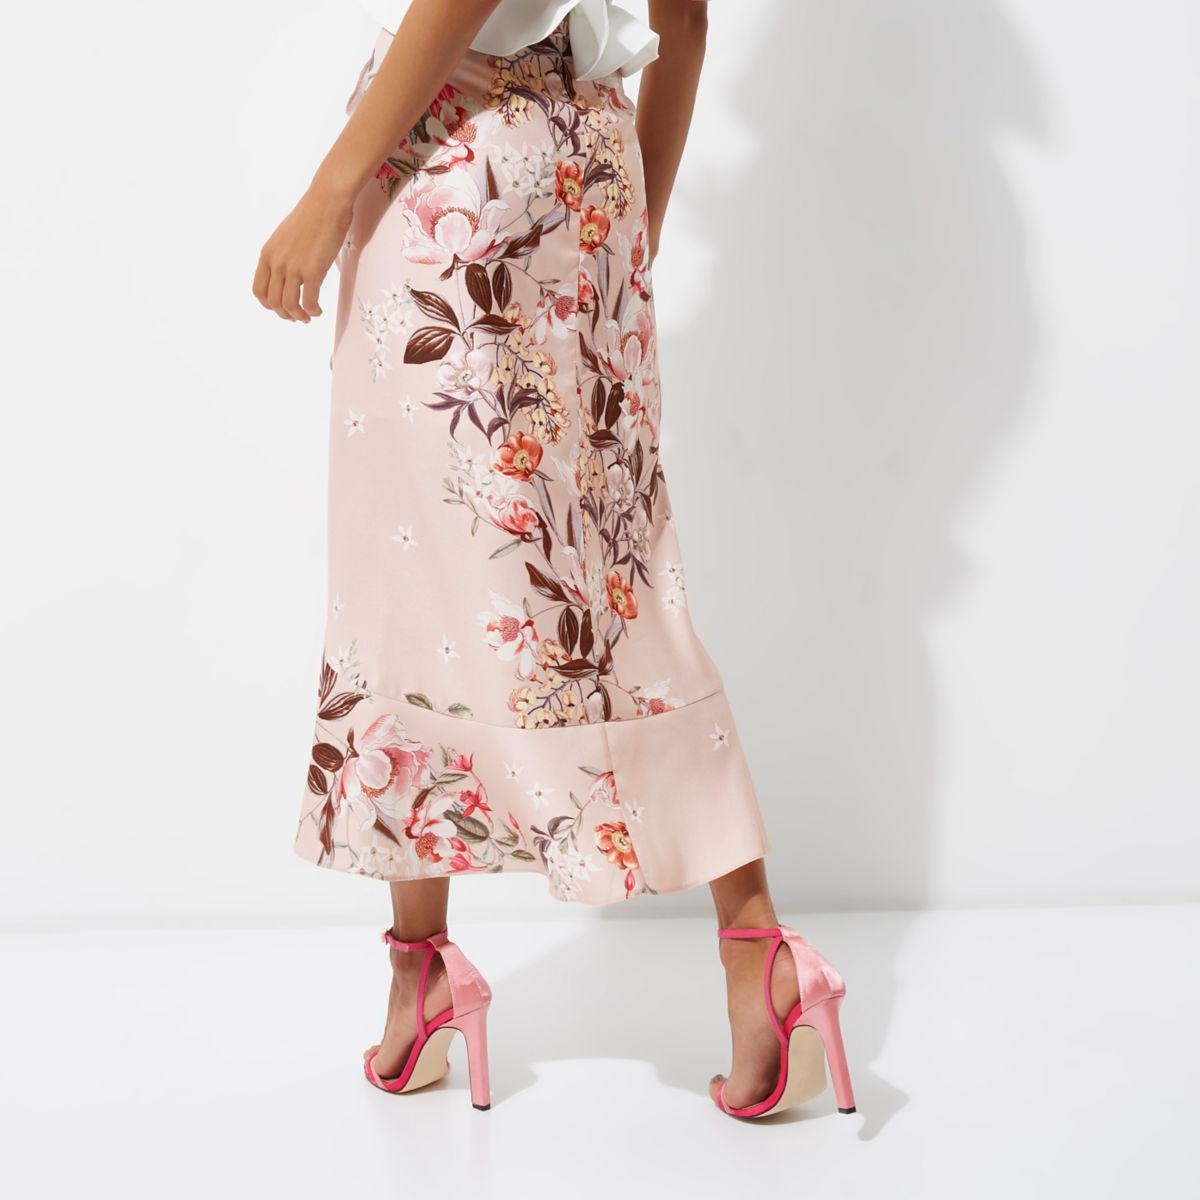 db699478c4 River Island Pink Floral Print Frill Hem Wrap Maxi Skirt in Pink - Lyst